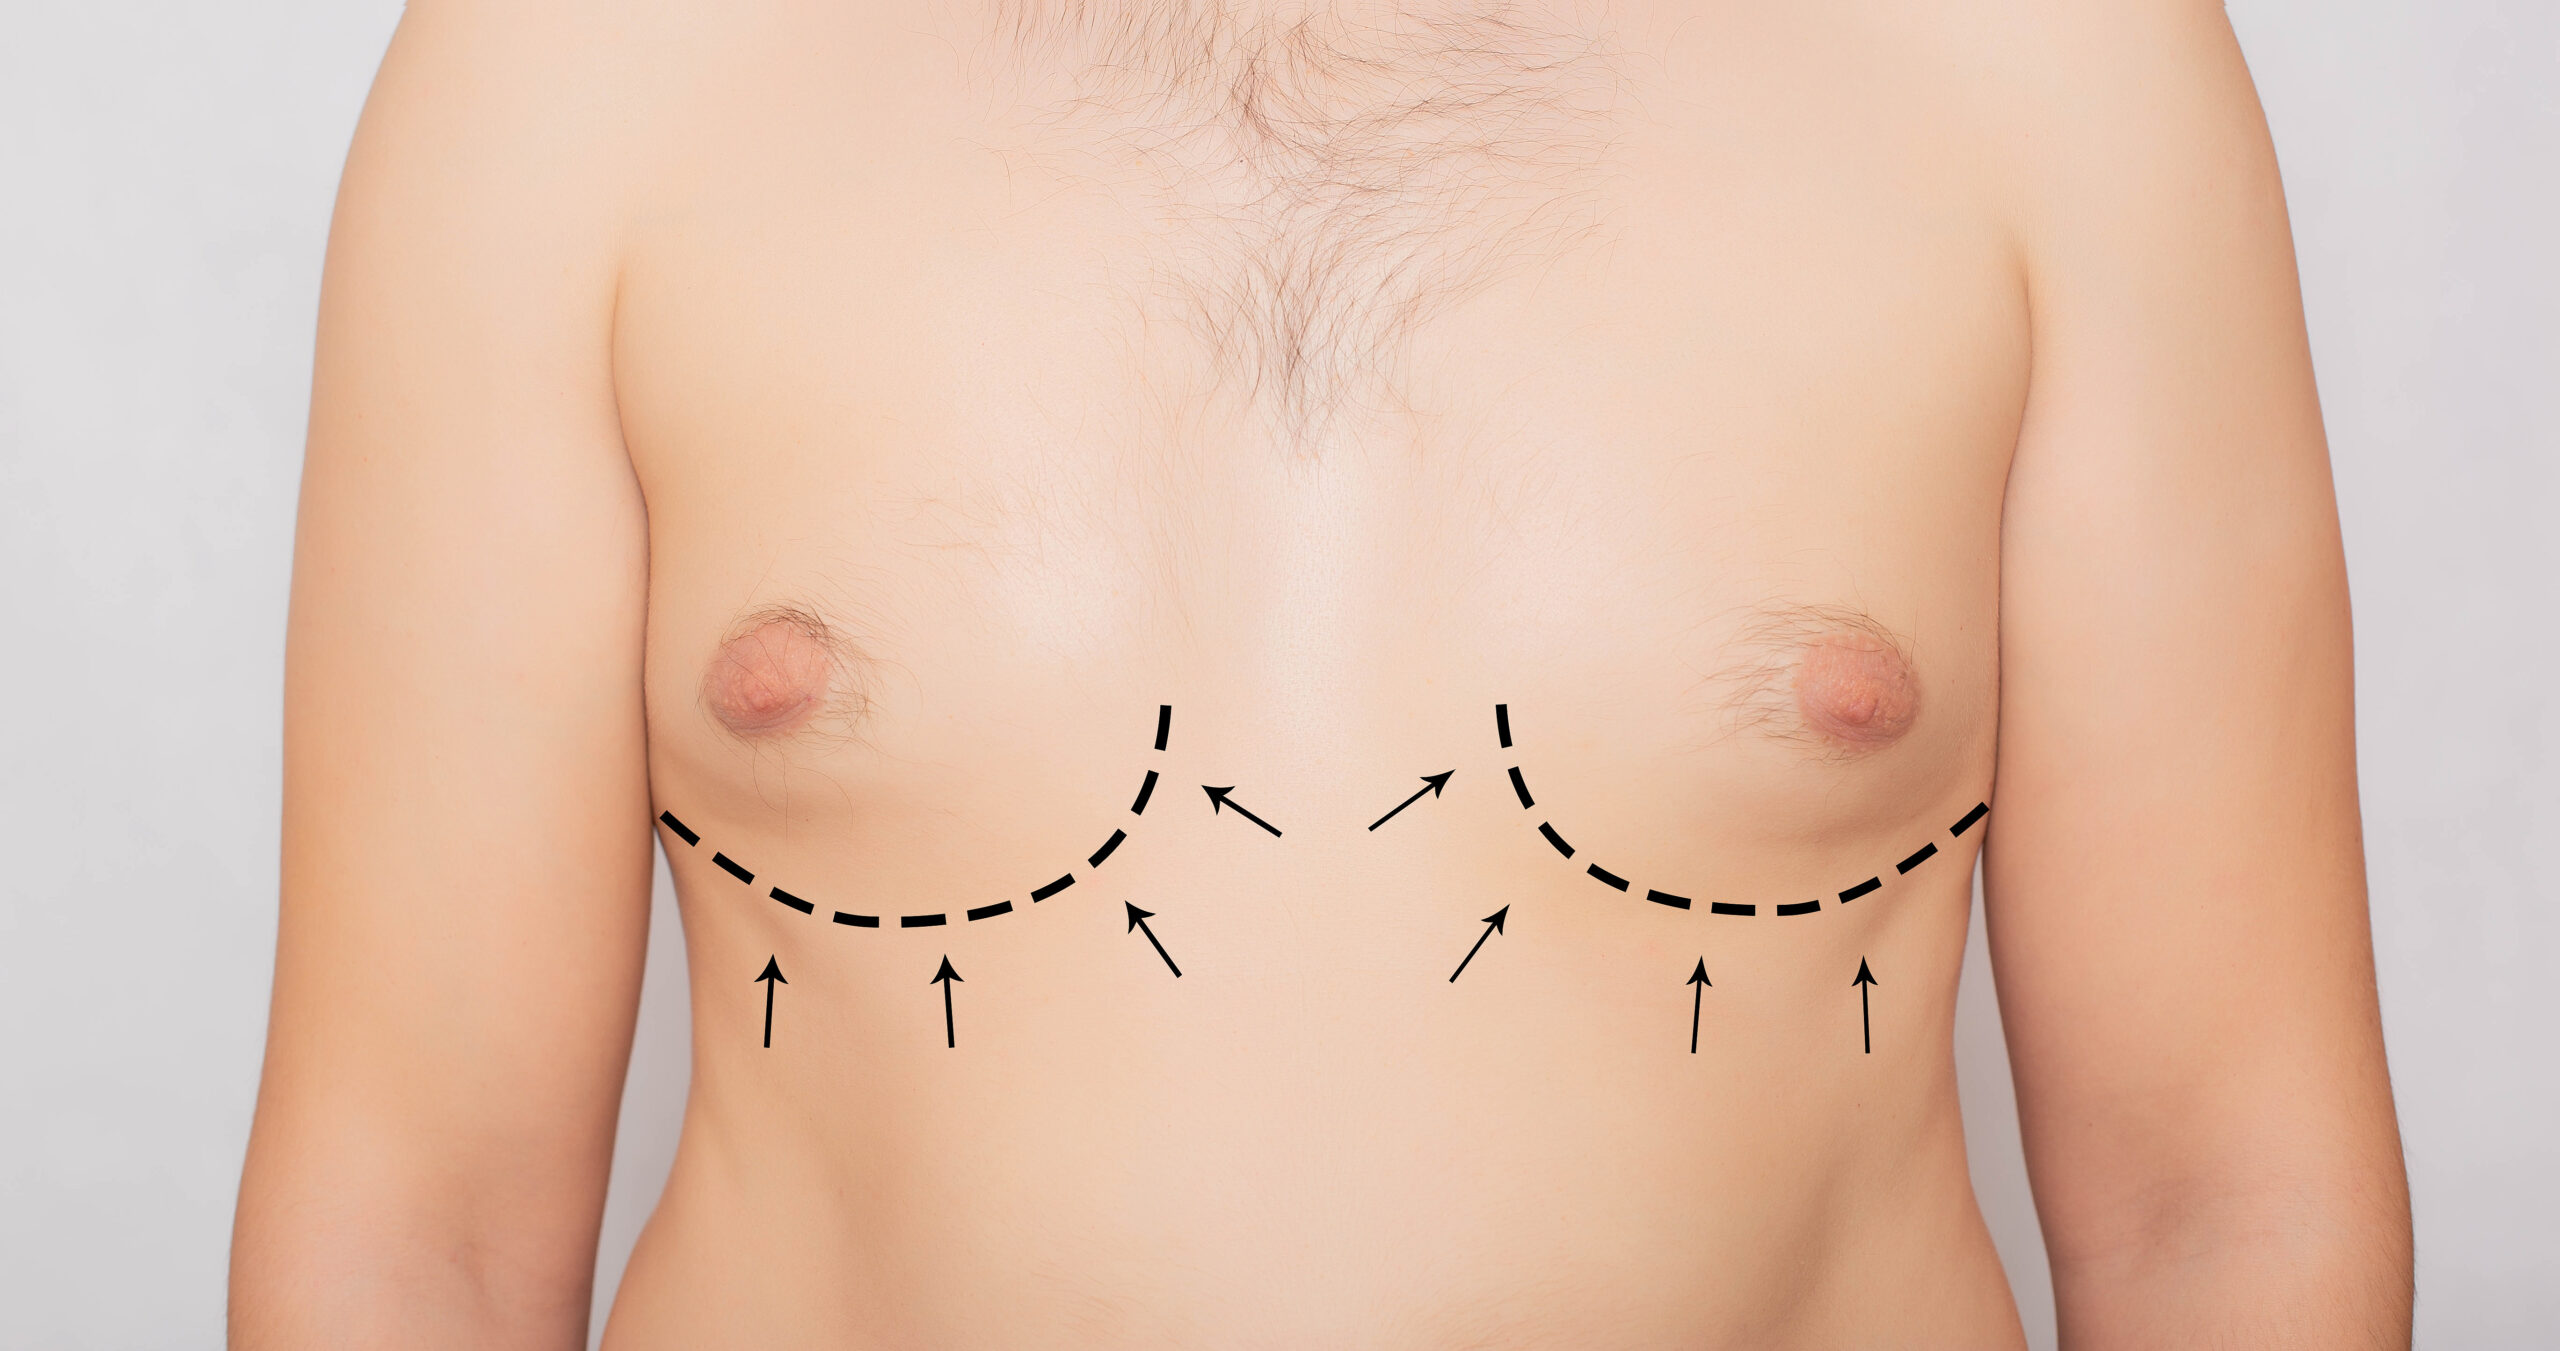 gynecomastia, top surgery, SkinOne, Vancouver BC